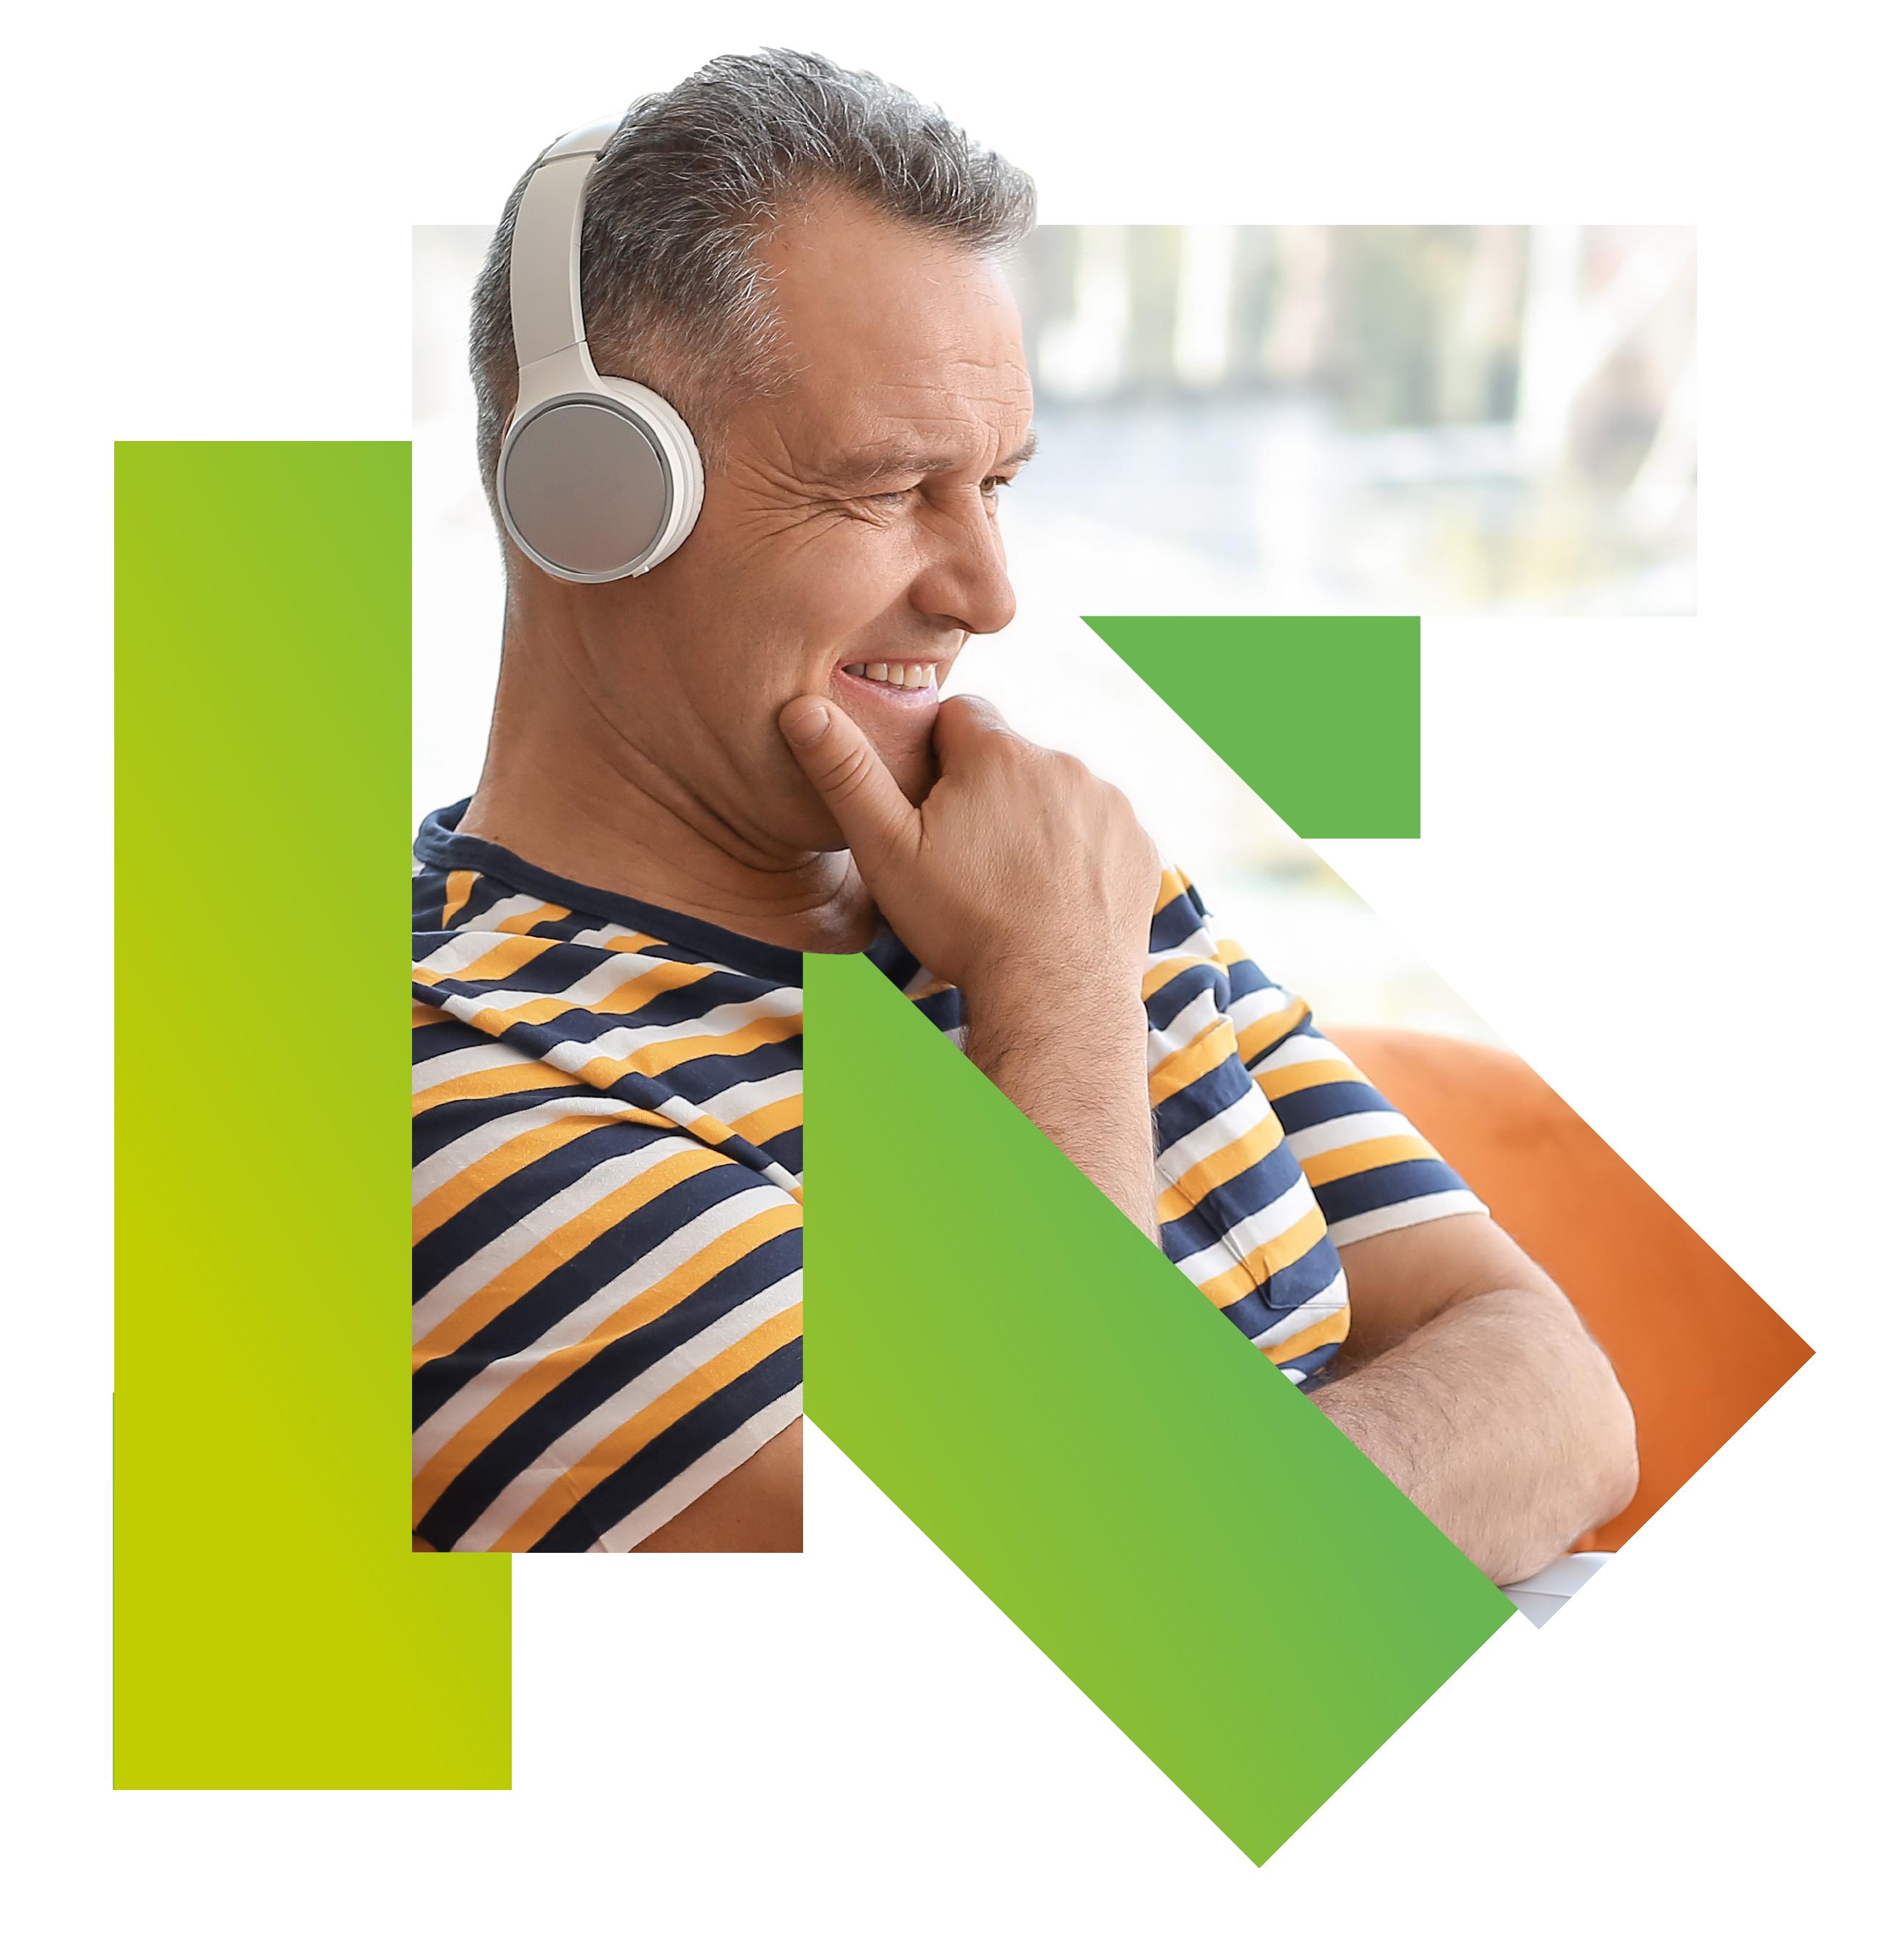 CIMSPA - Digtial Marketing Hub - Graphic Elements - double arrow man